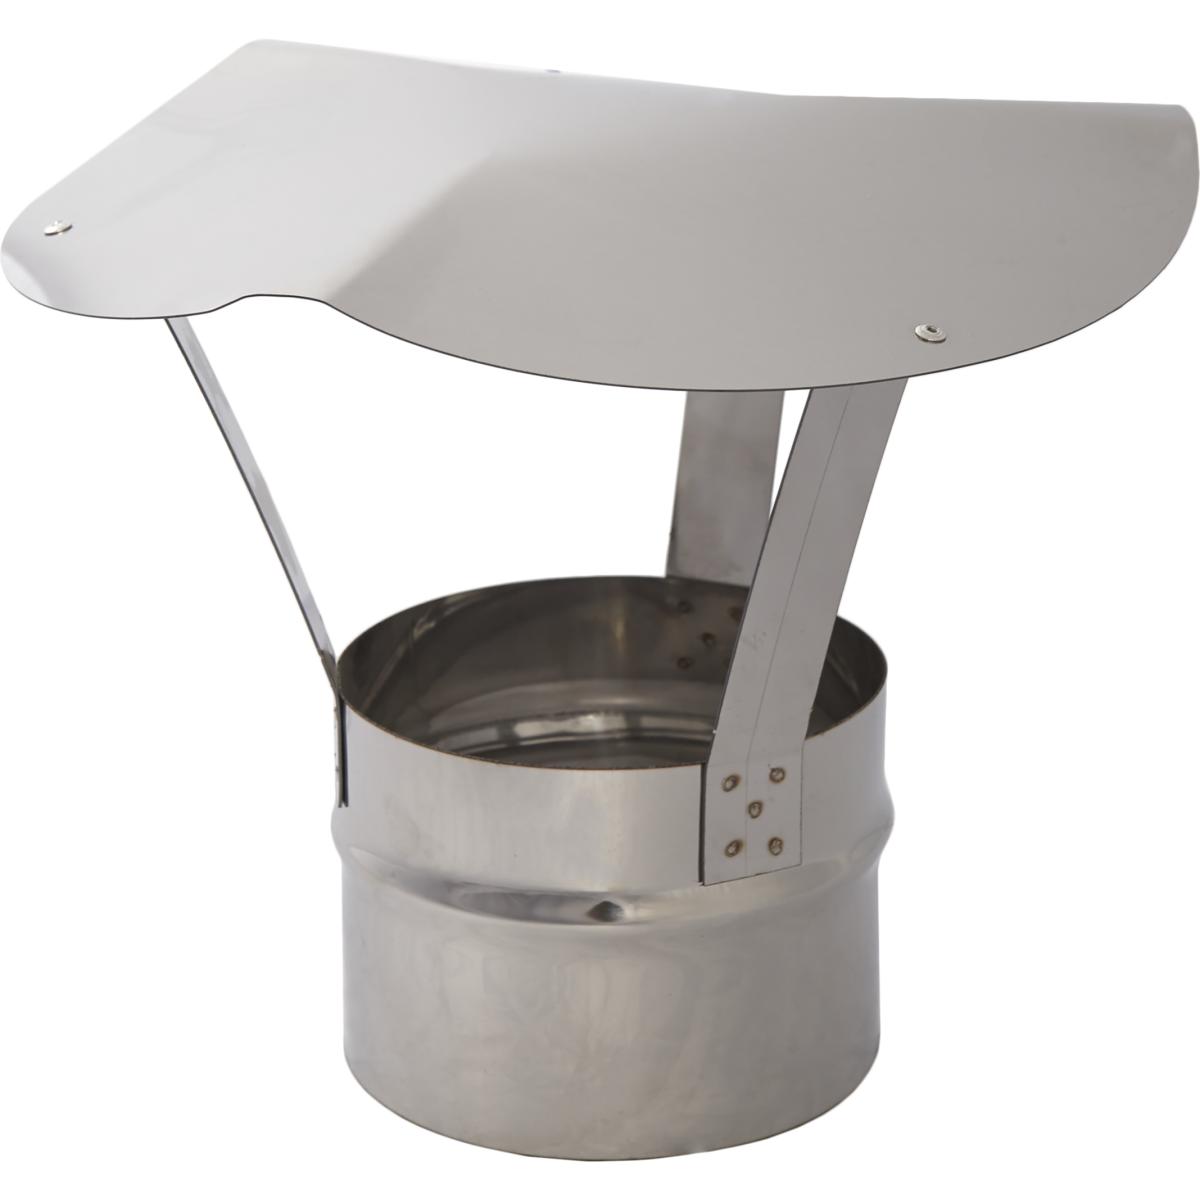 Зонт-к (430/0.5 мм) D150 мм